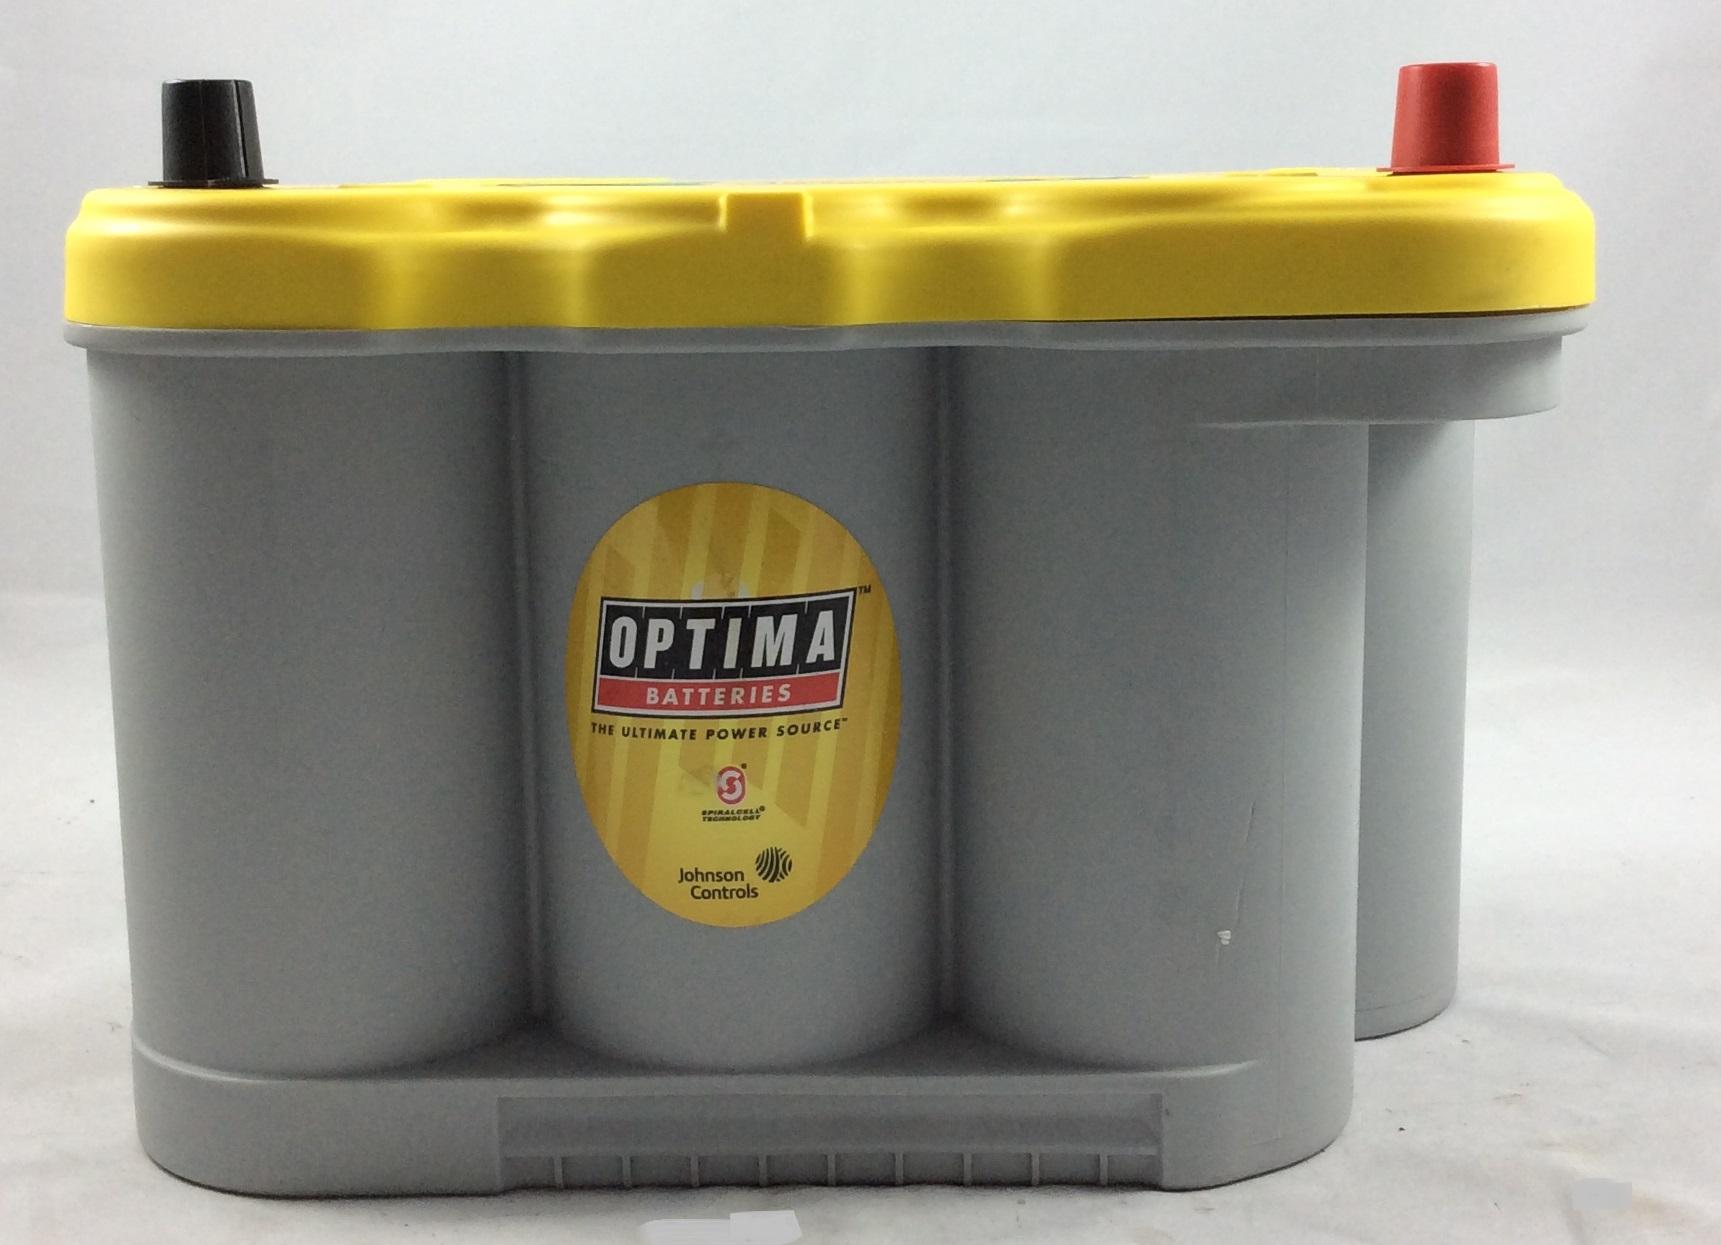 BATTERIA OPTIMA 12V 66AH 845A(EN) YTR5.0